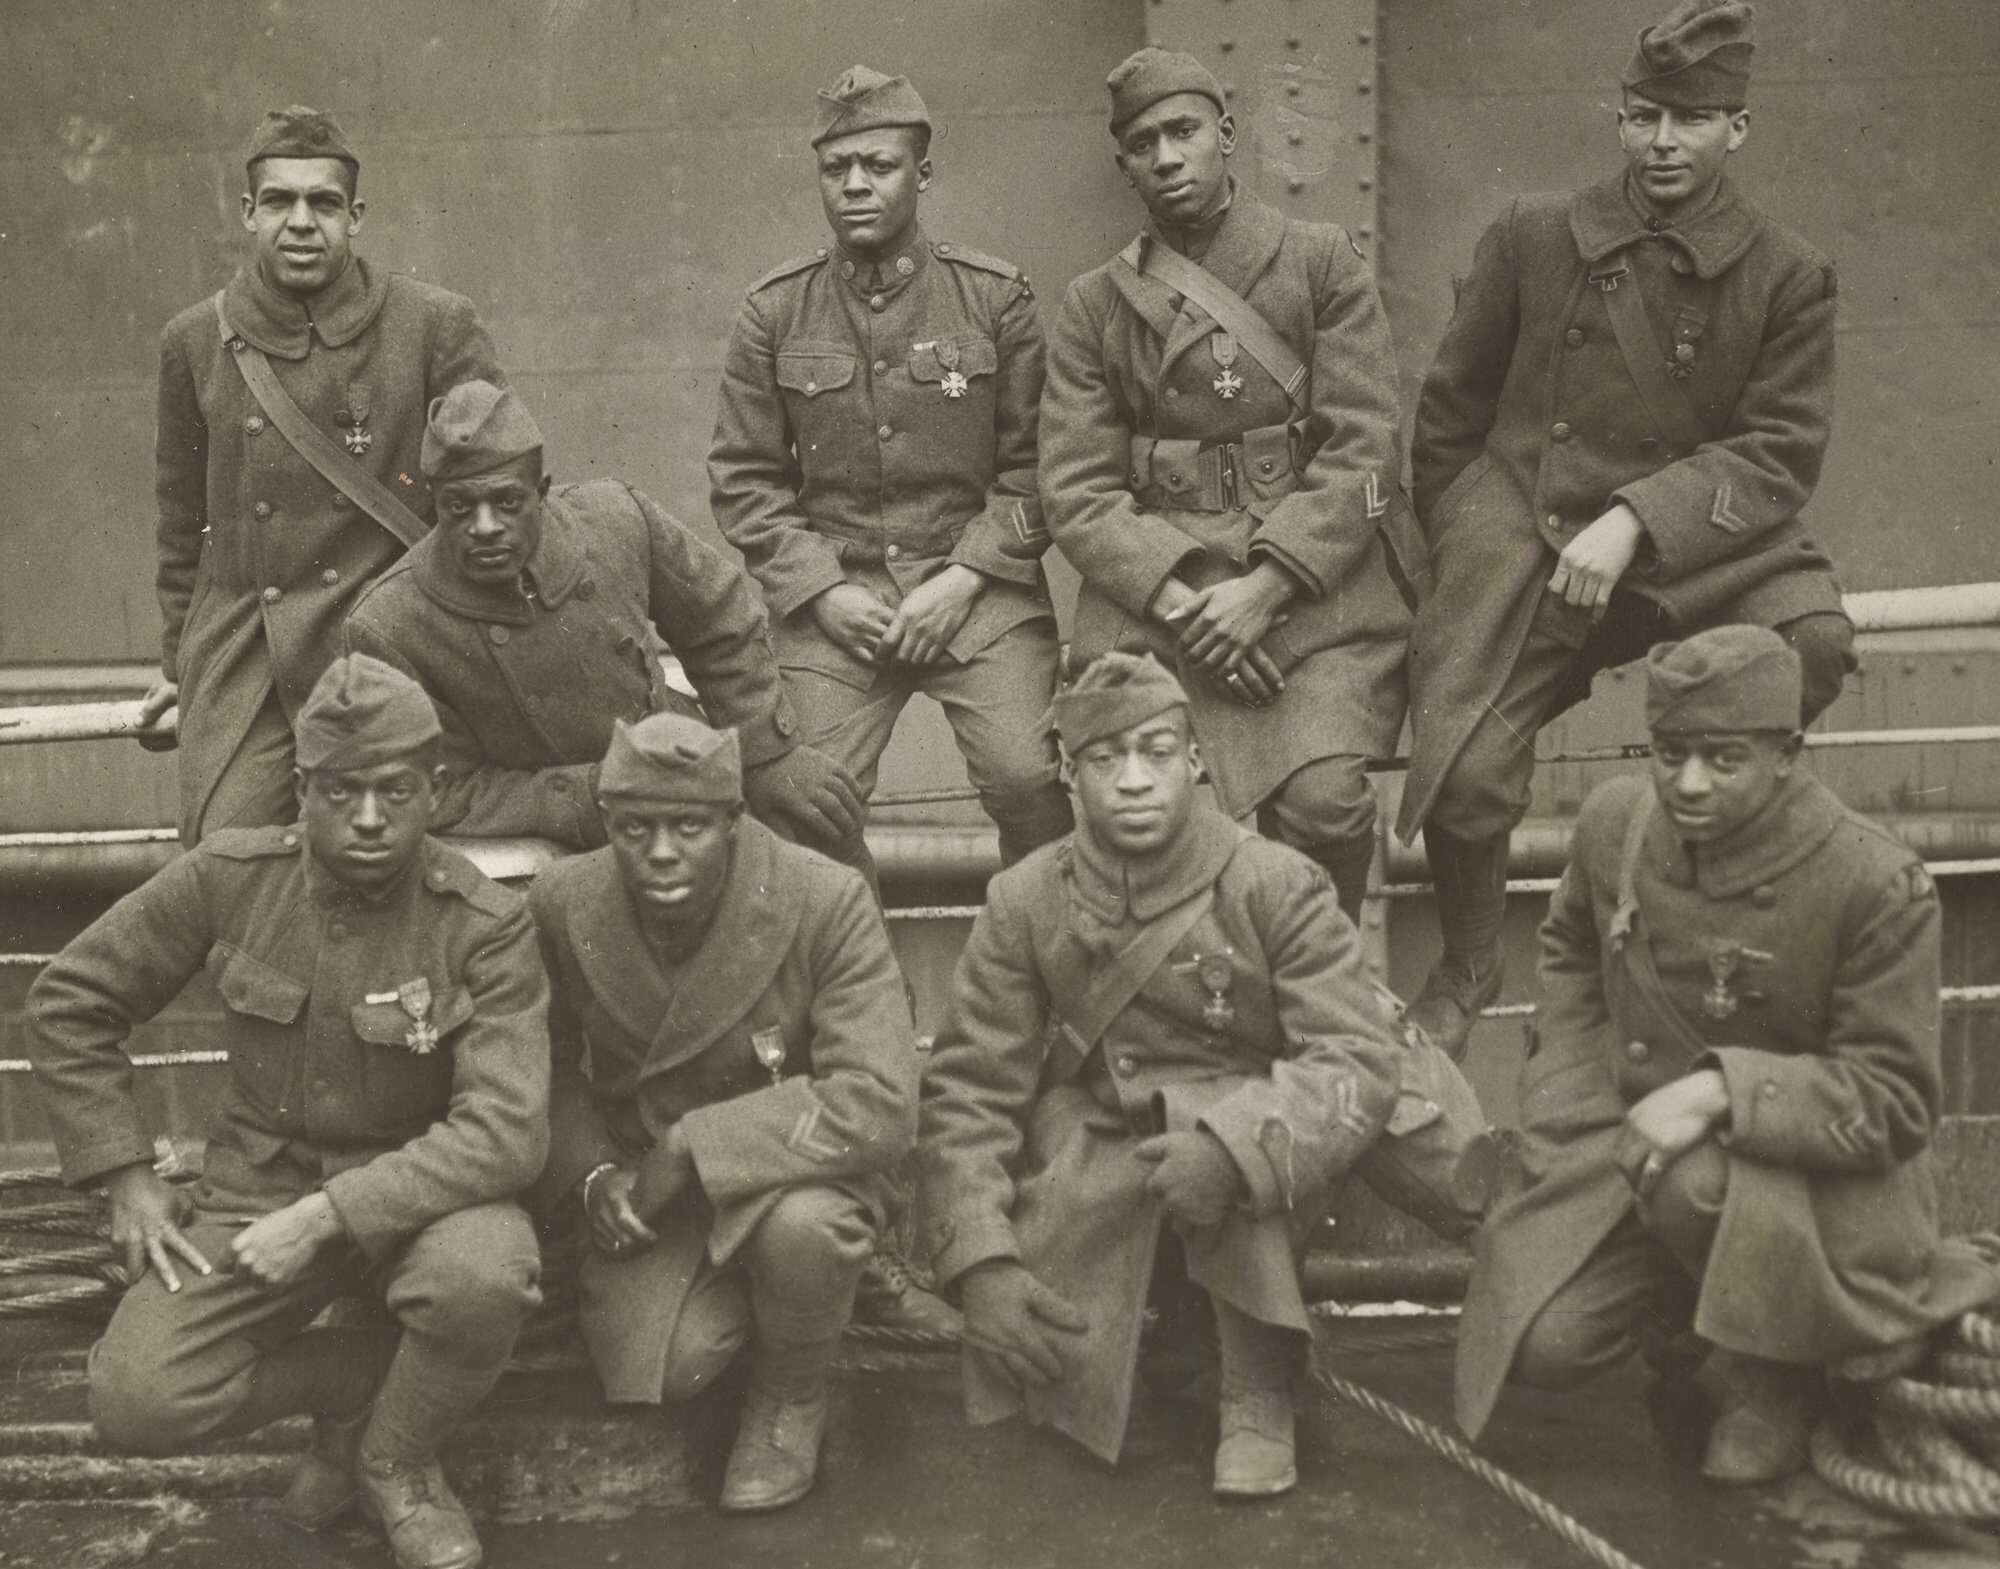 Wilson-Race-Colored-Troops-1917-1918-NARA-165-WW-127A-008.jpg